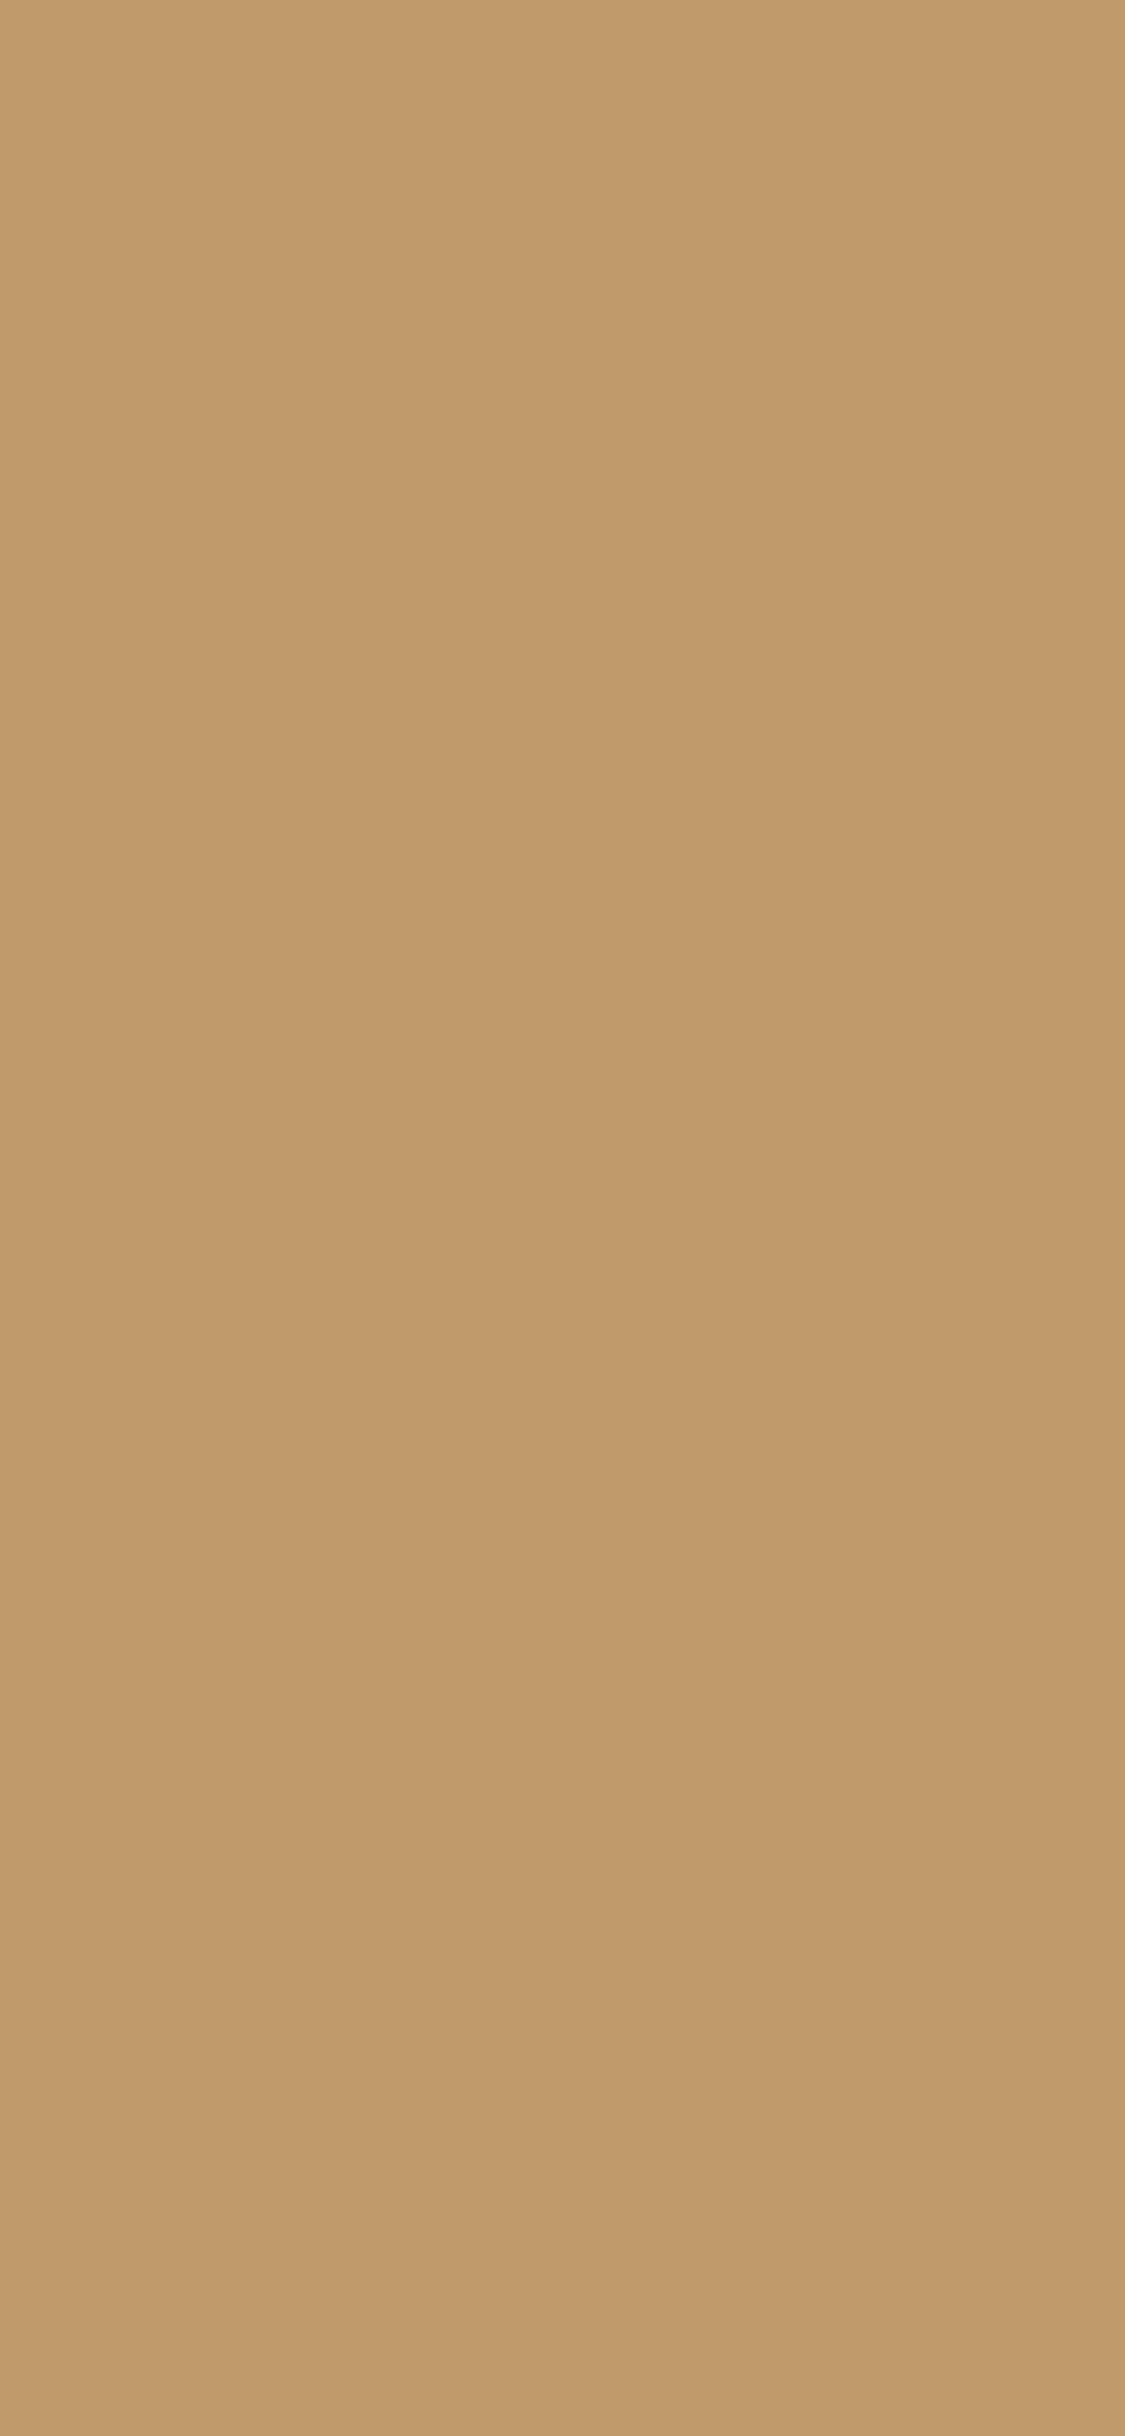 1125x2436 Lion Solid Color Background